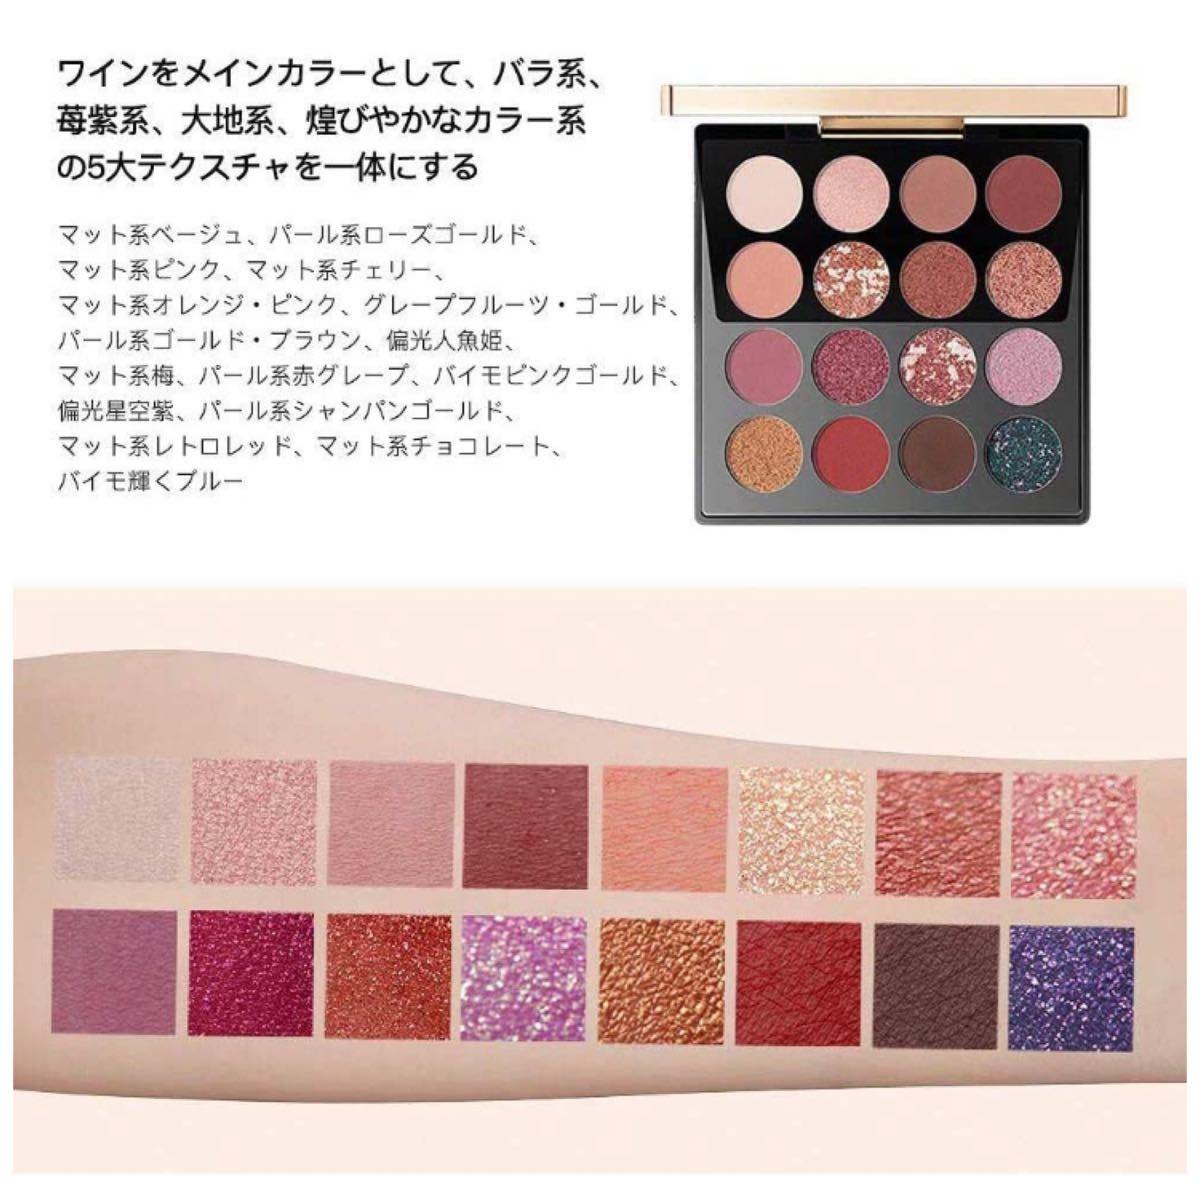 zeesea アイシャドウパレット 新品 未使用 中国コスメ 化粧品 正規品 発色がいい 箱付き